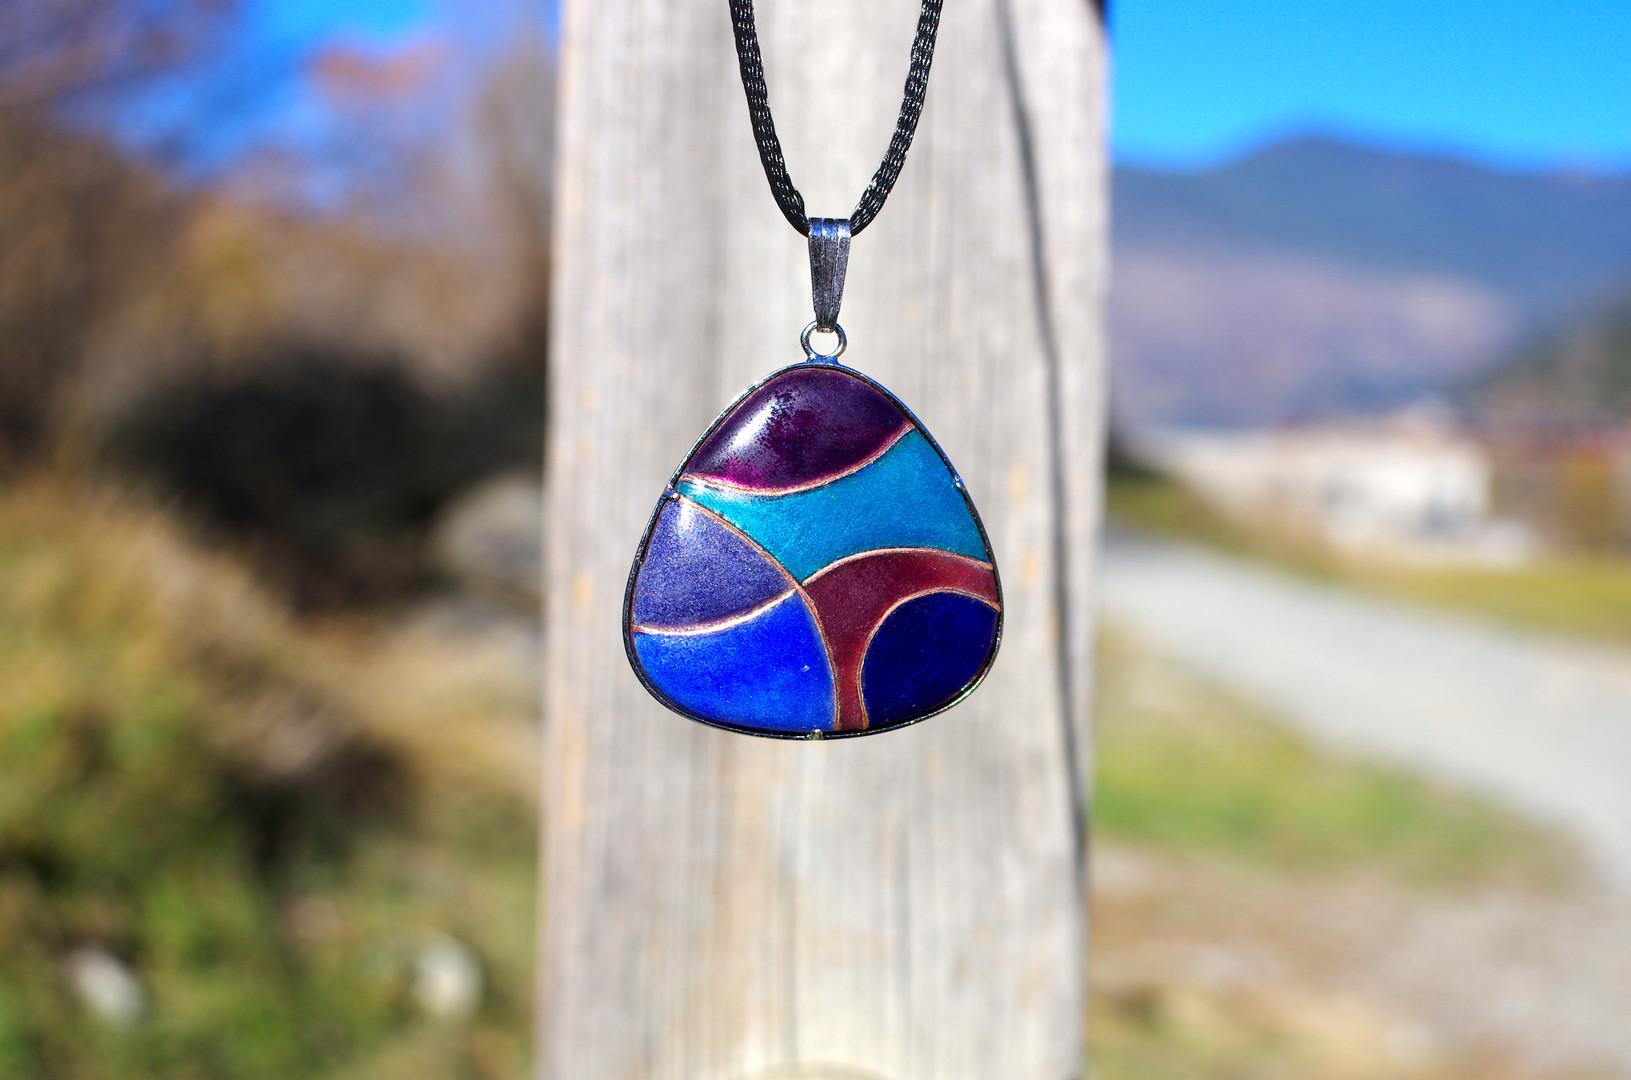 Mosaico pendant